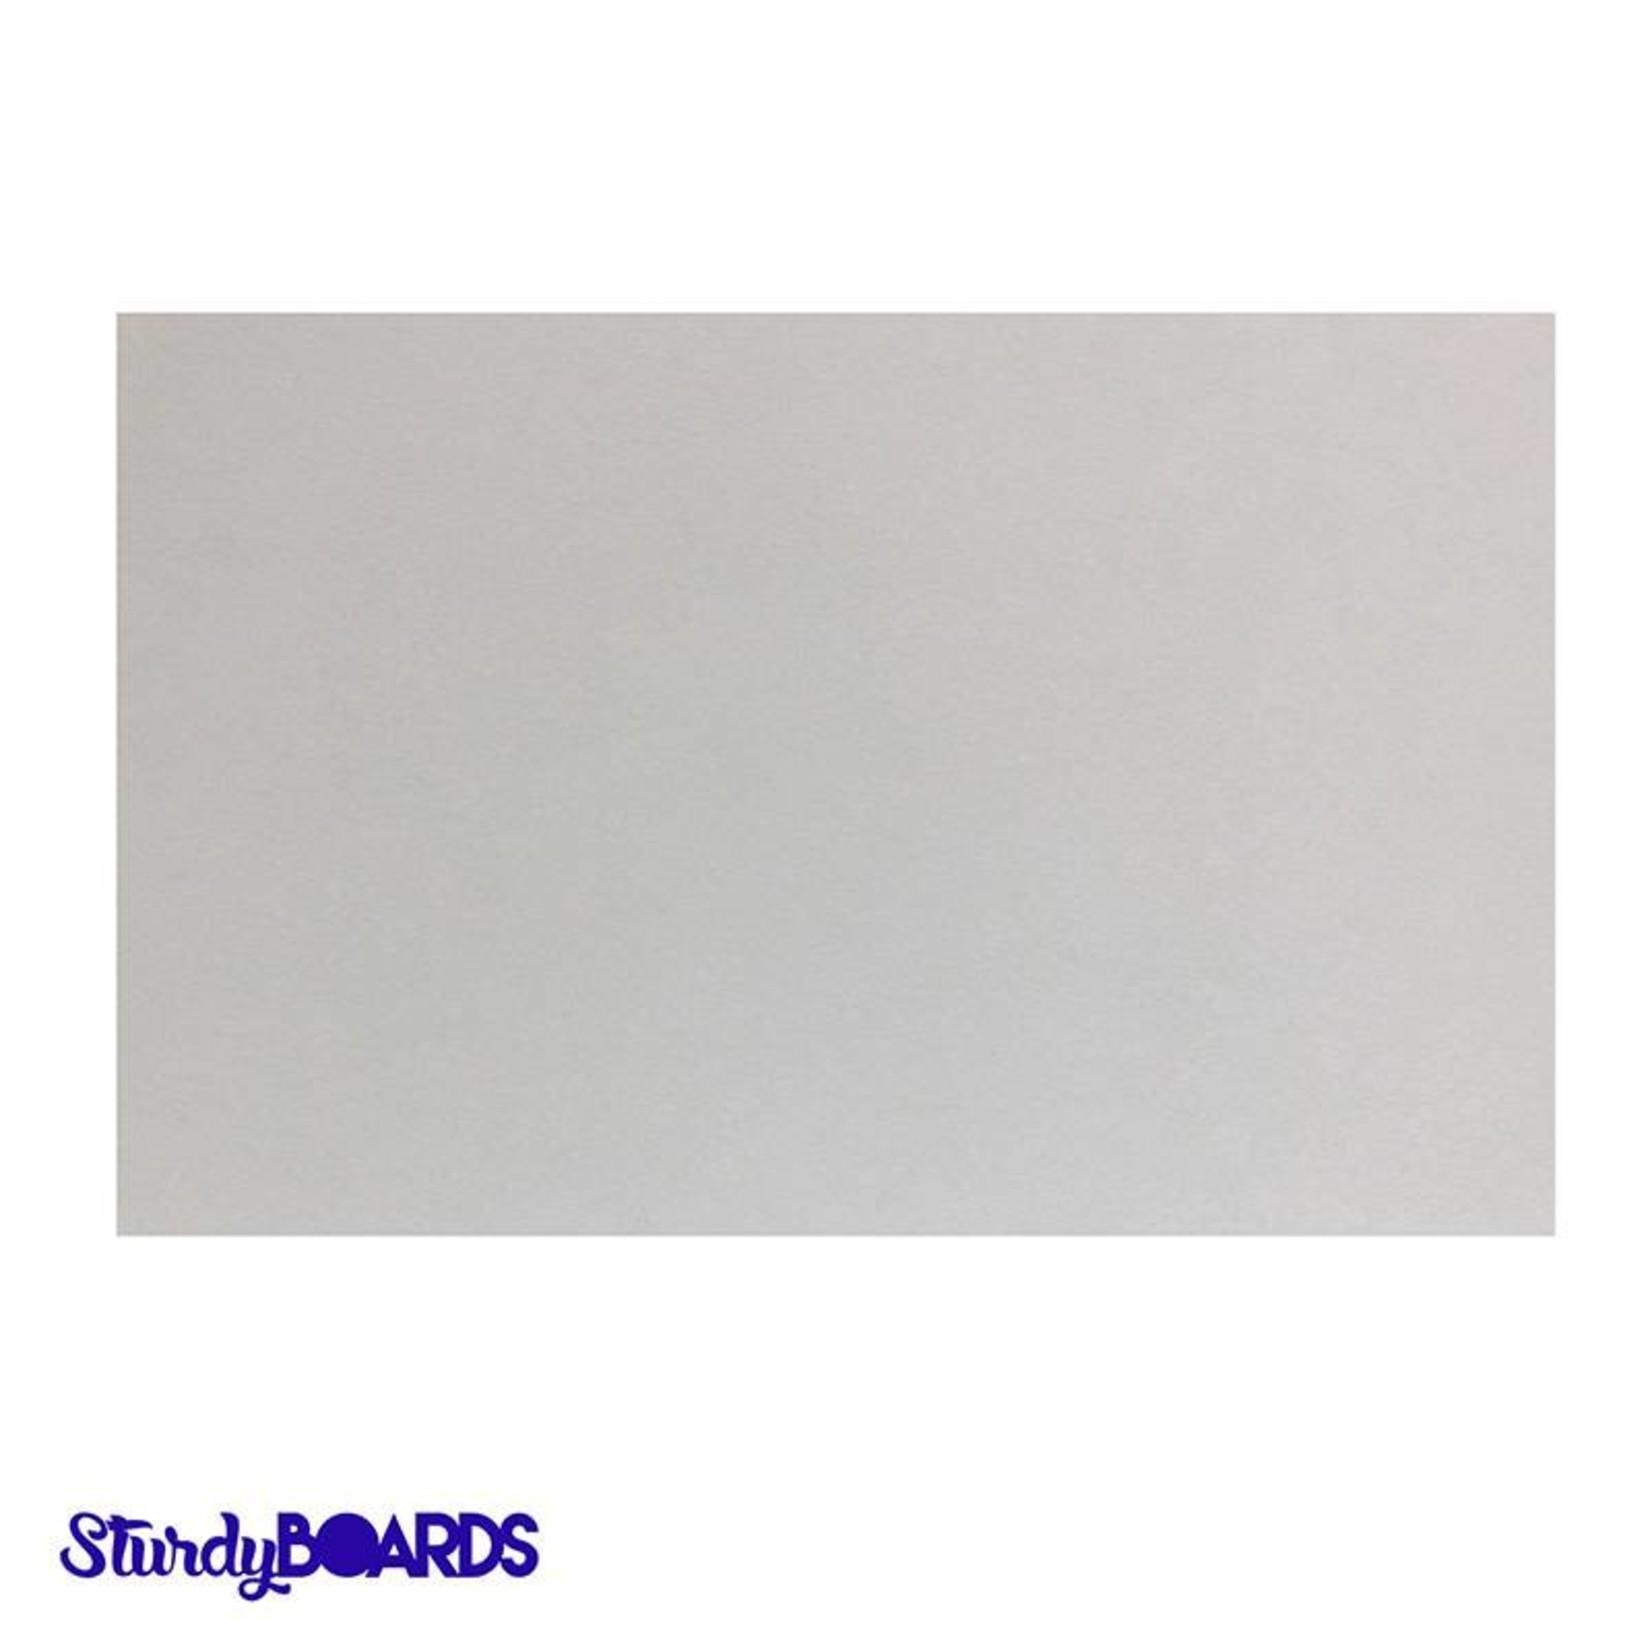 Unger Unger - Sturdy cake board, White -